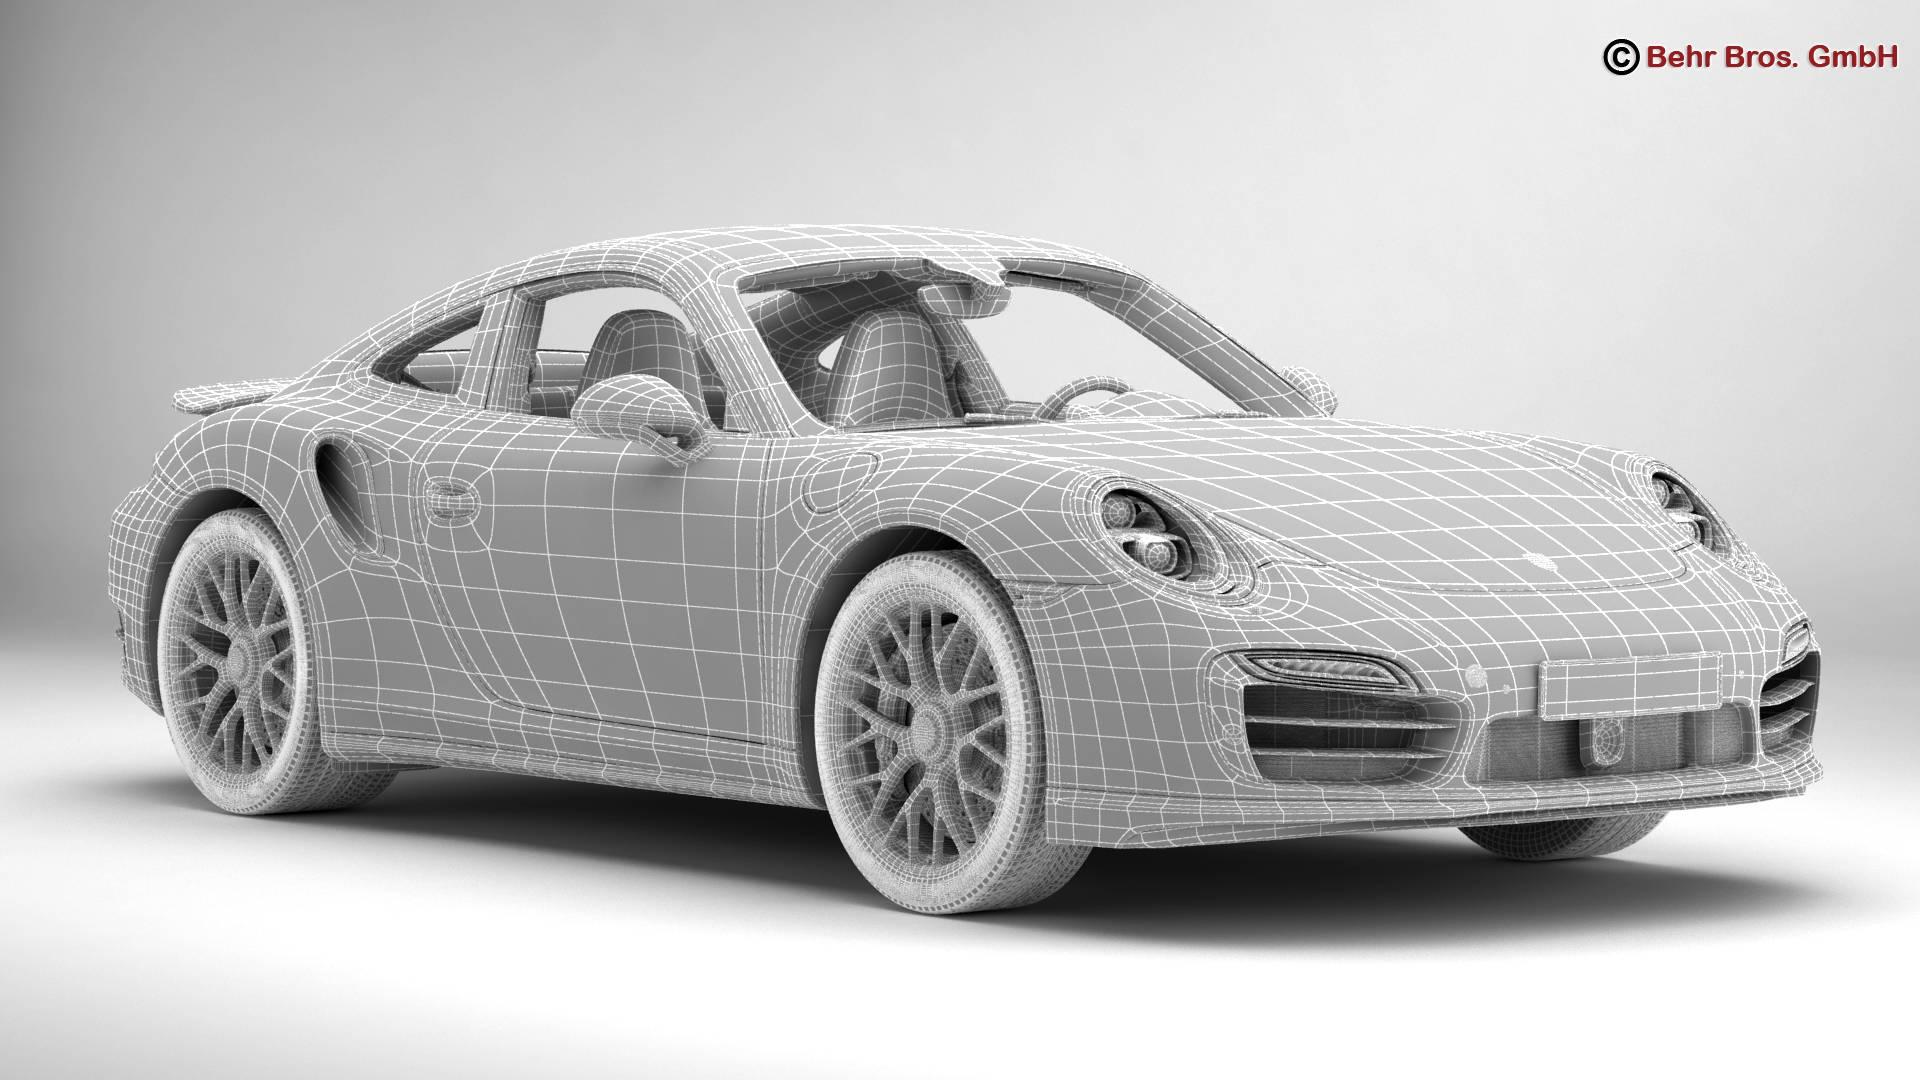 porsche 911 turbo s 2014 3d model 3ds max fbx c4d lwo ma mb obj 212491